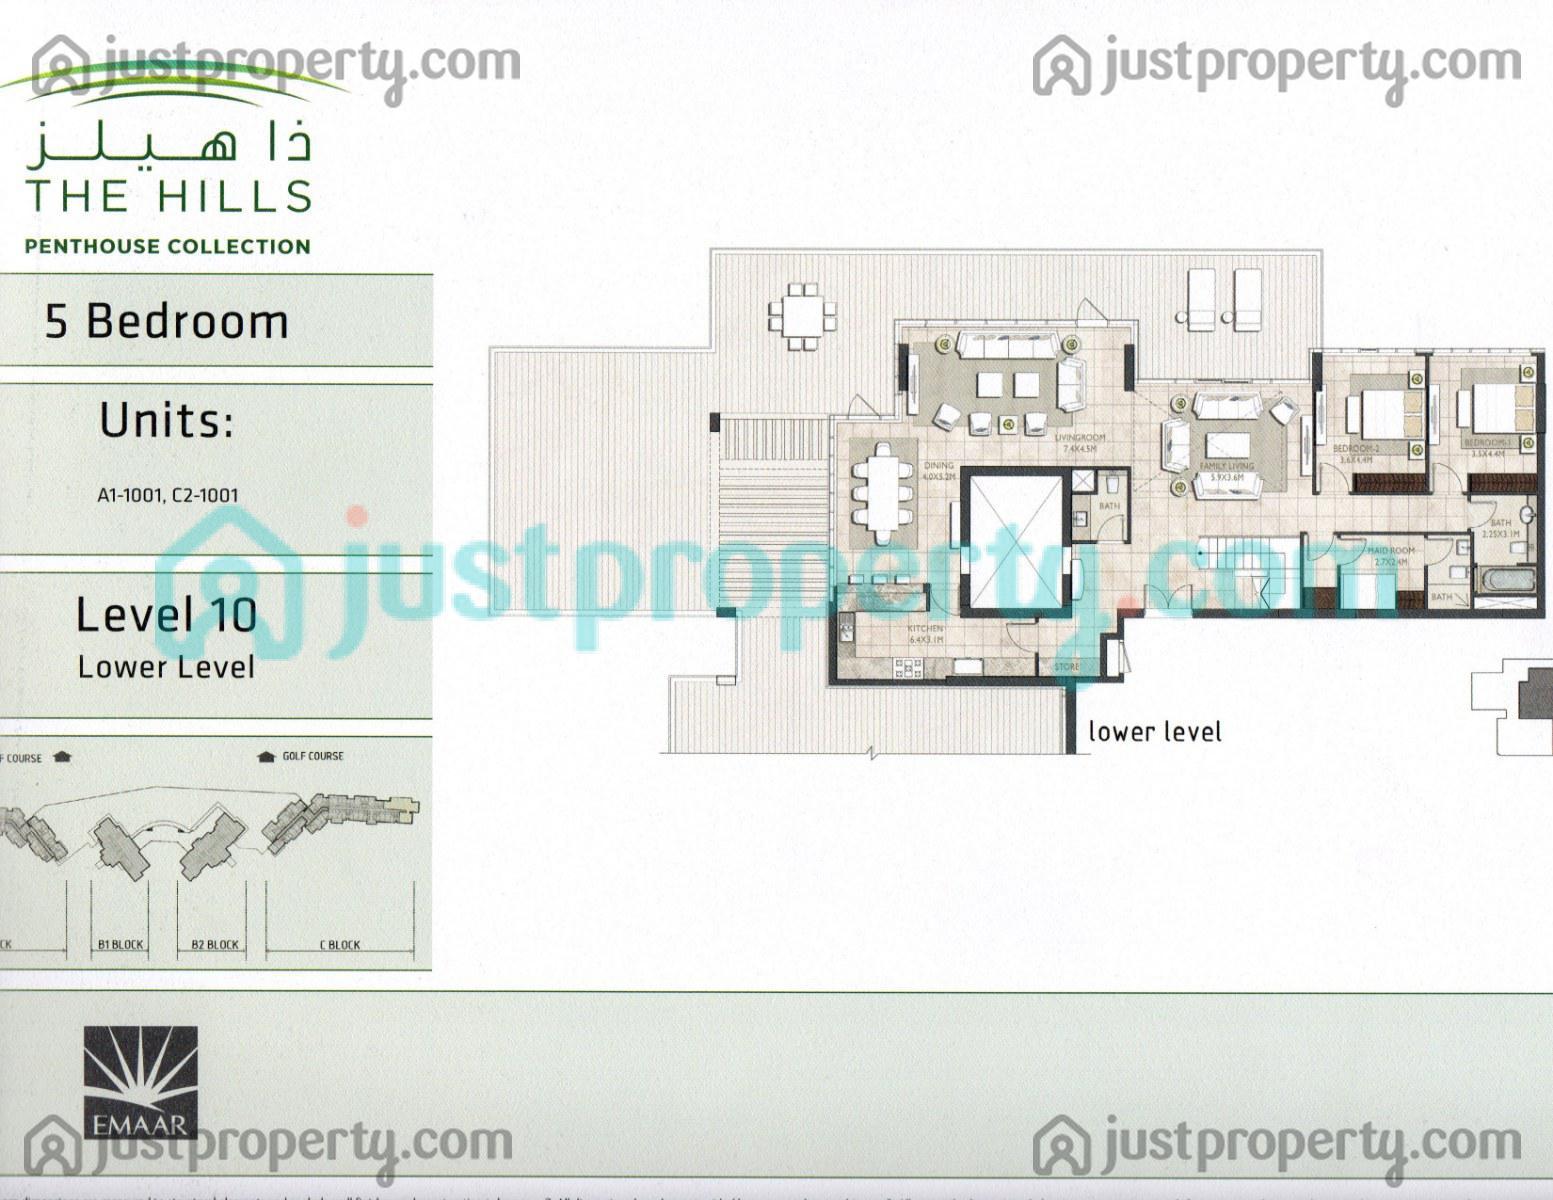 The Hills Penthouse Collection Floor Plans | JustProperty.com